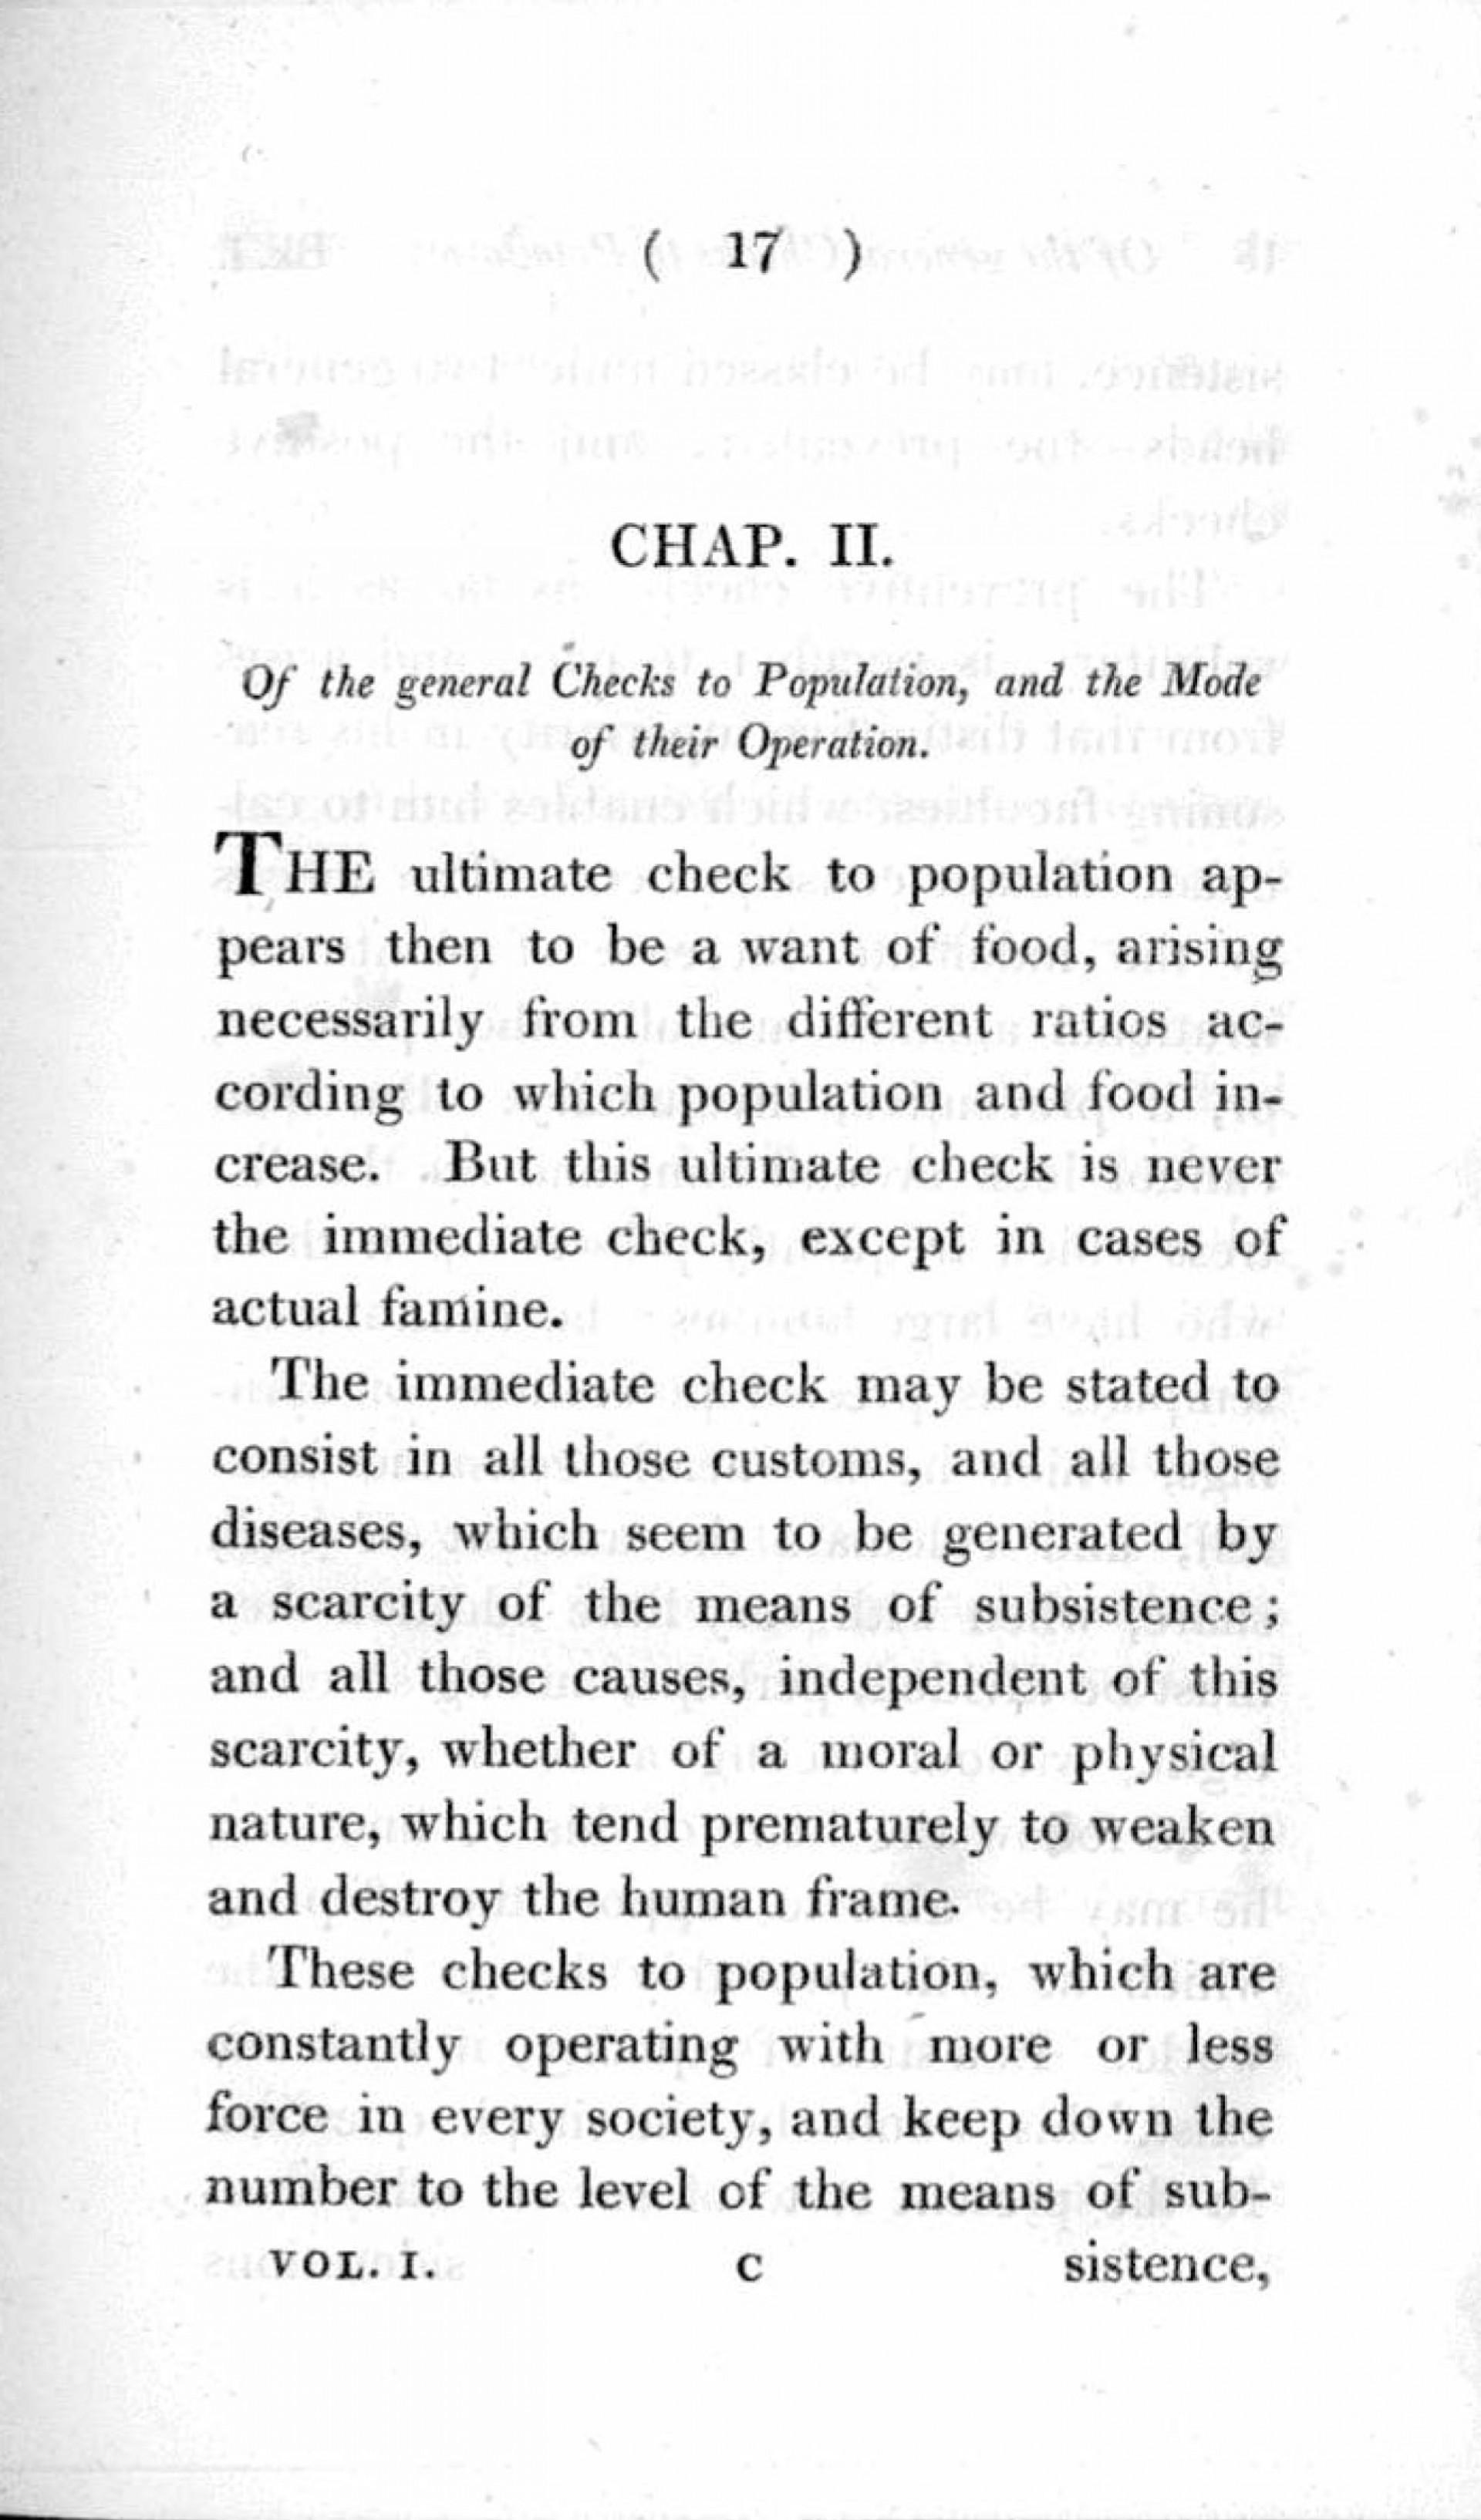 014 Essay Example Essays On Unbelievable Racism In Schools Best Argumentative 1920